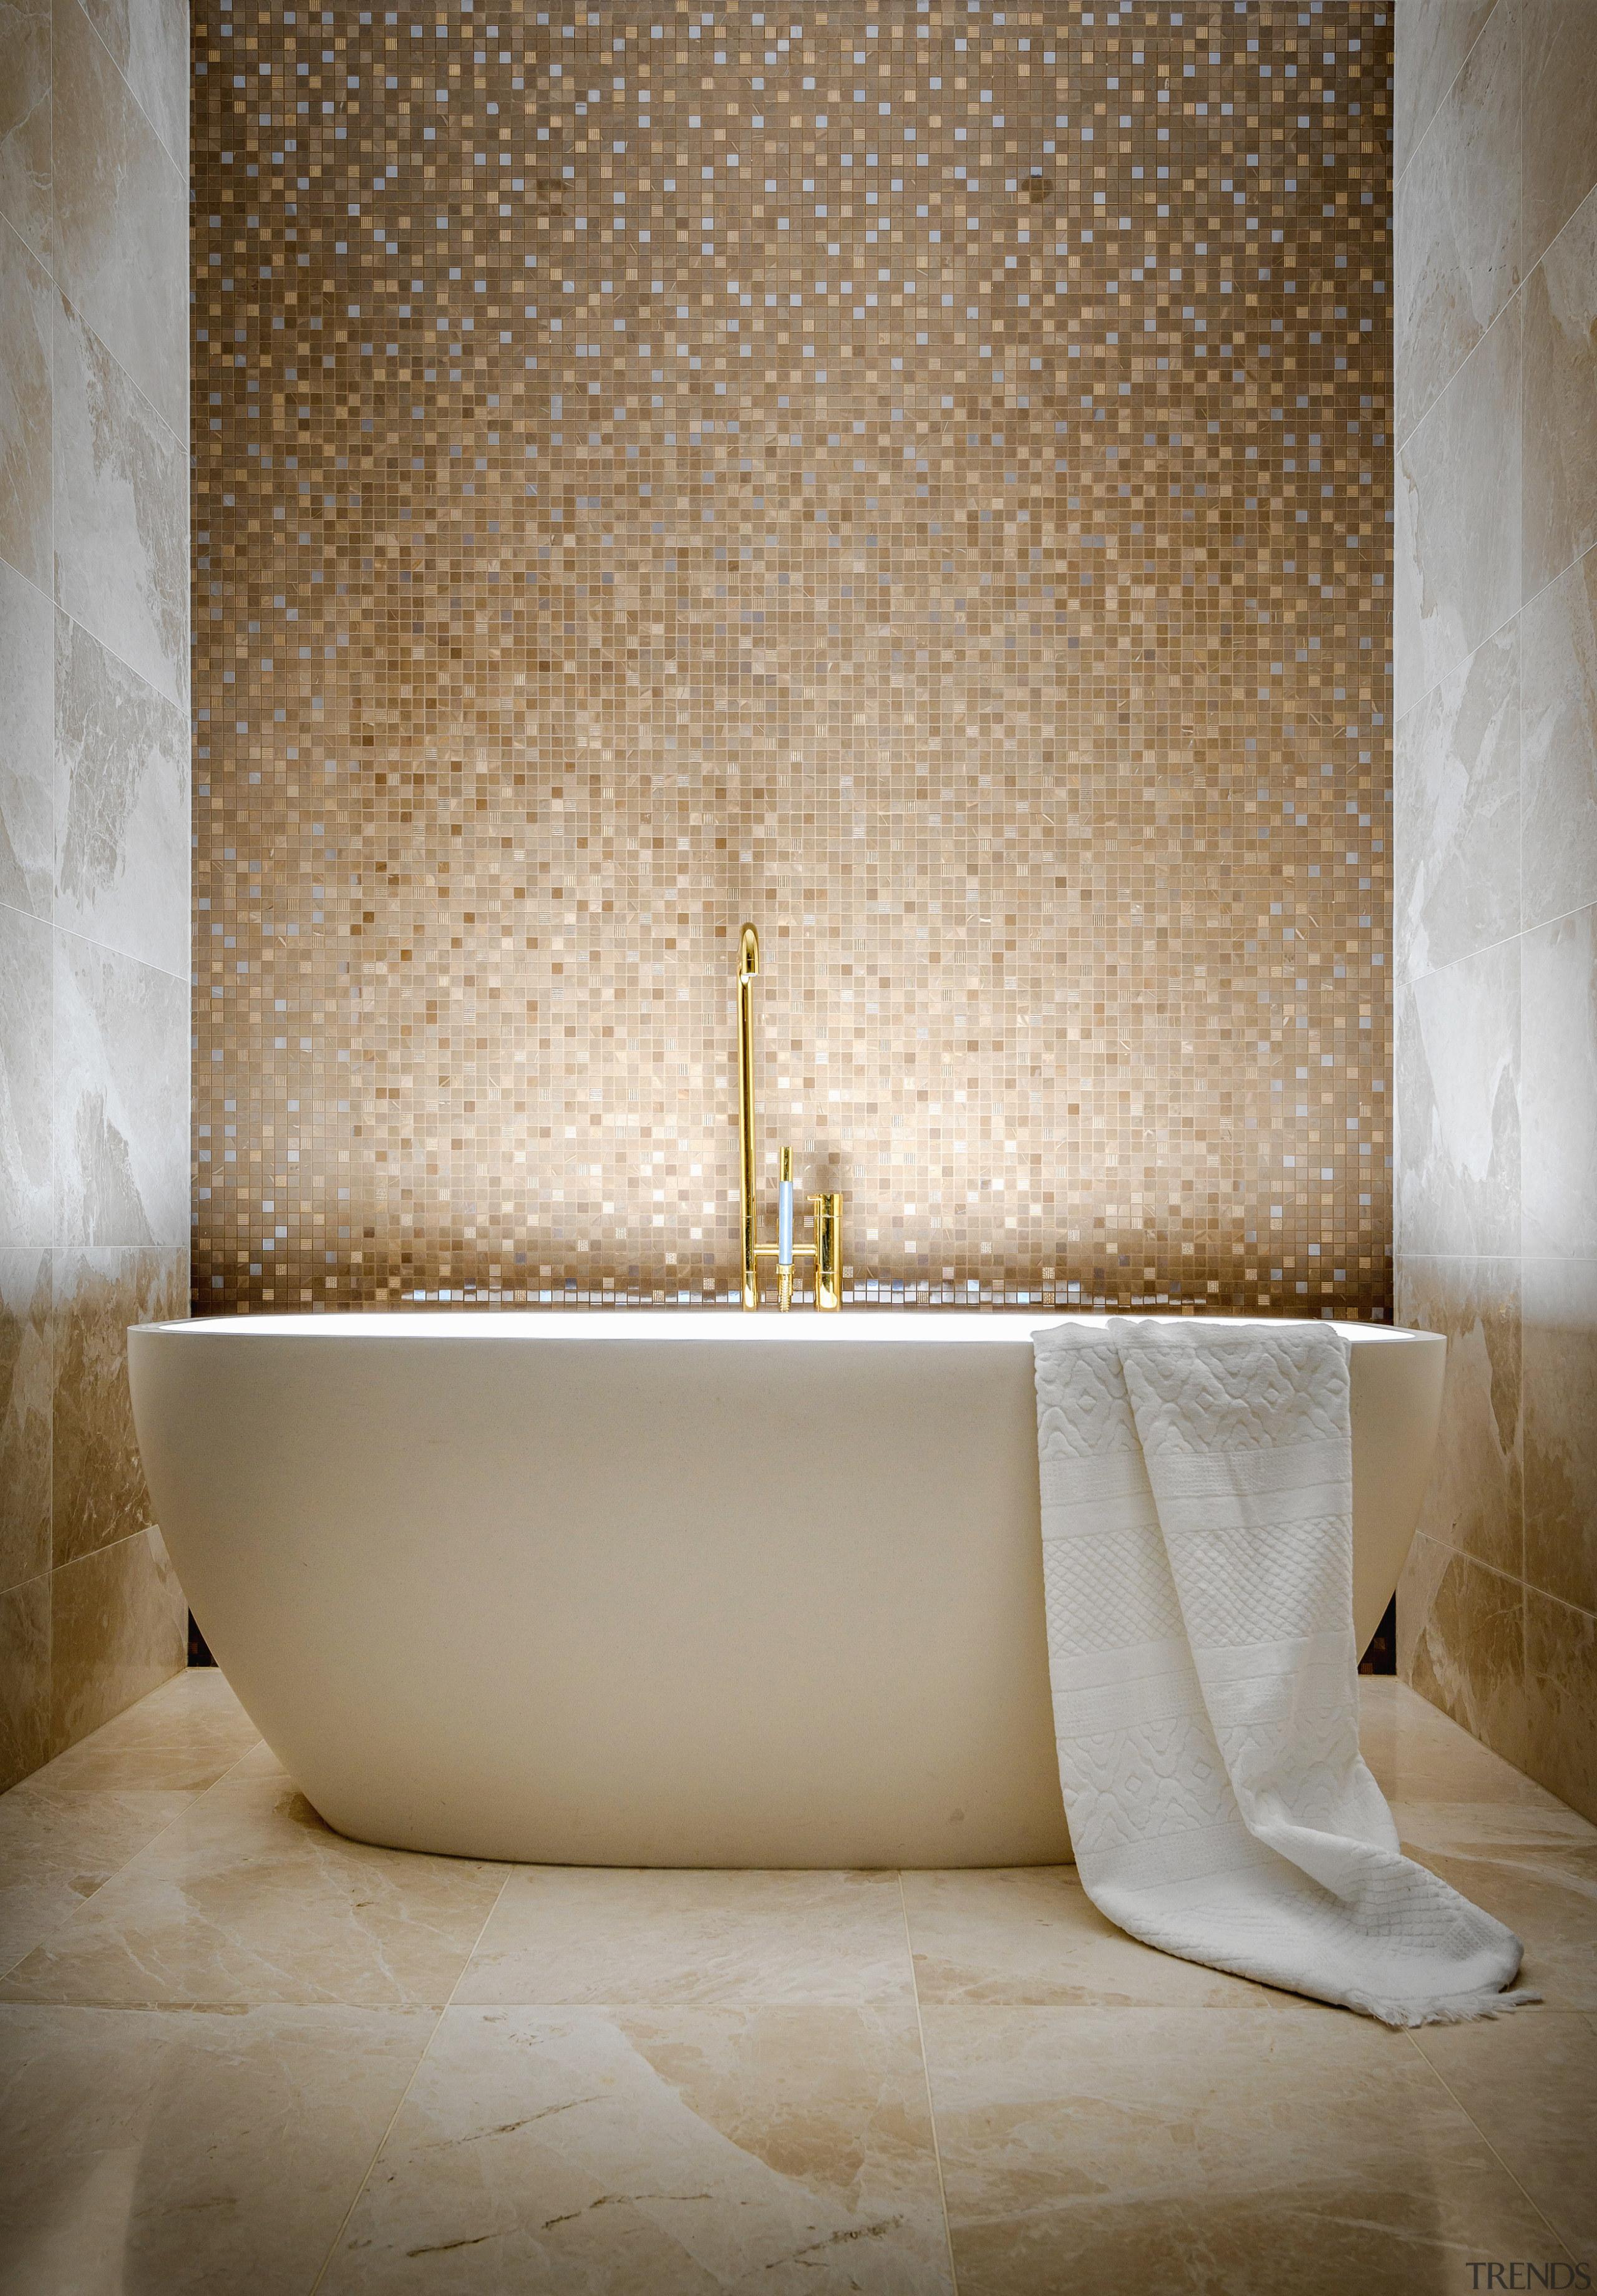 Bathed in luxury – large-format marble tile on architecture, bathroom, bathtub, Davinia sutton, marble tiles, ensuite, freestanding tub